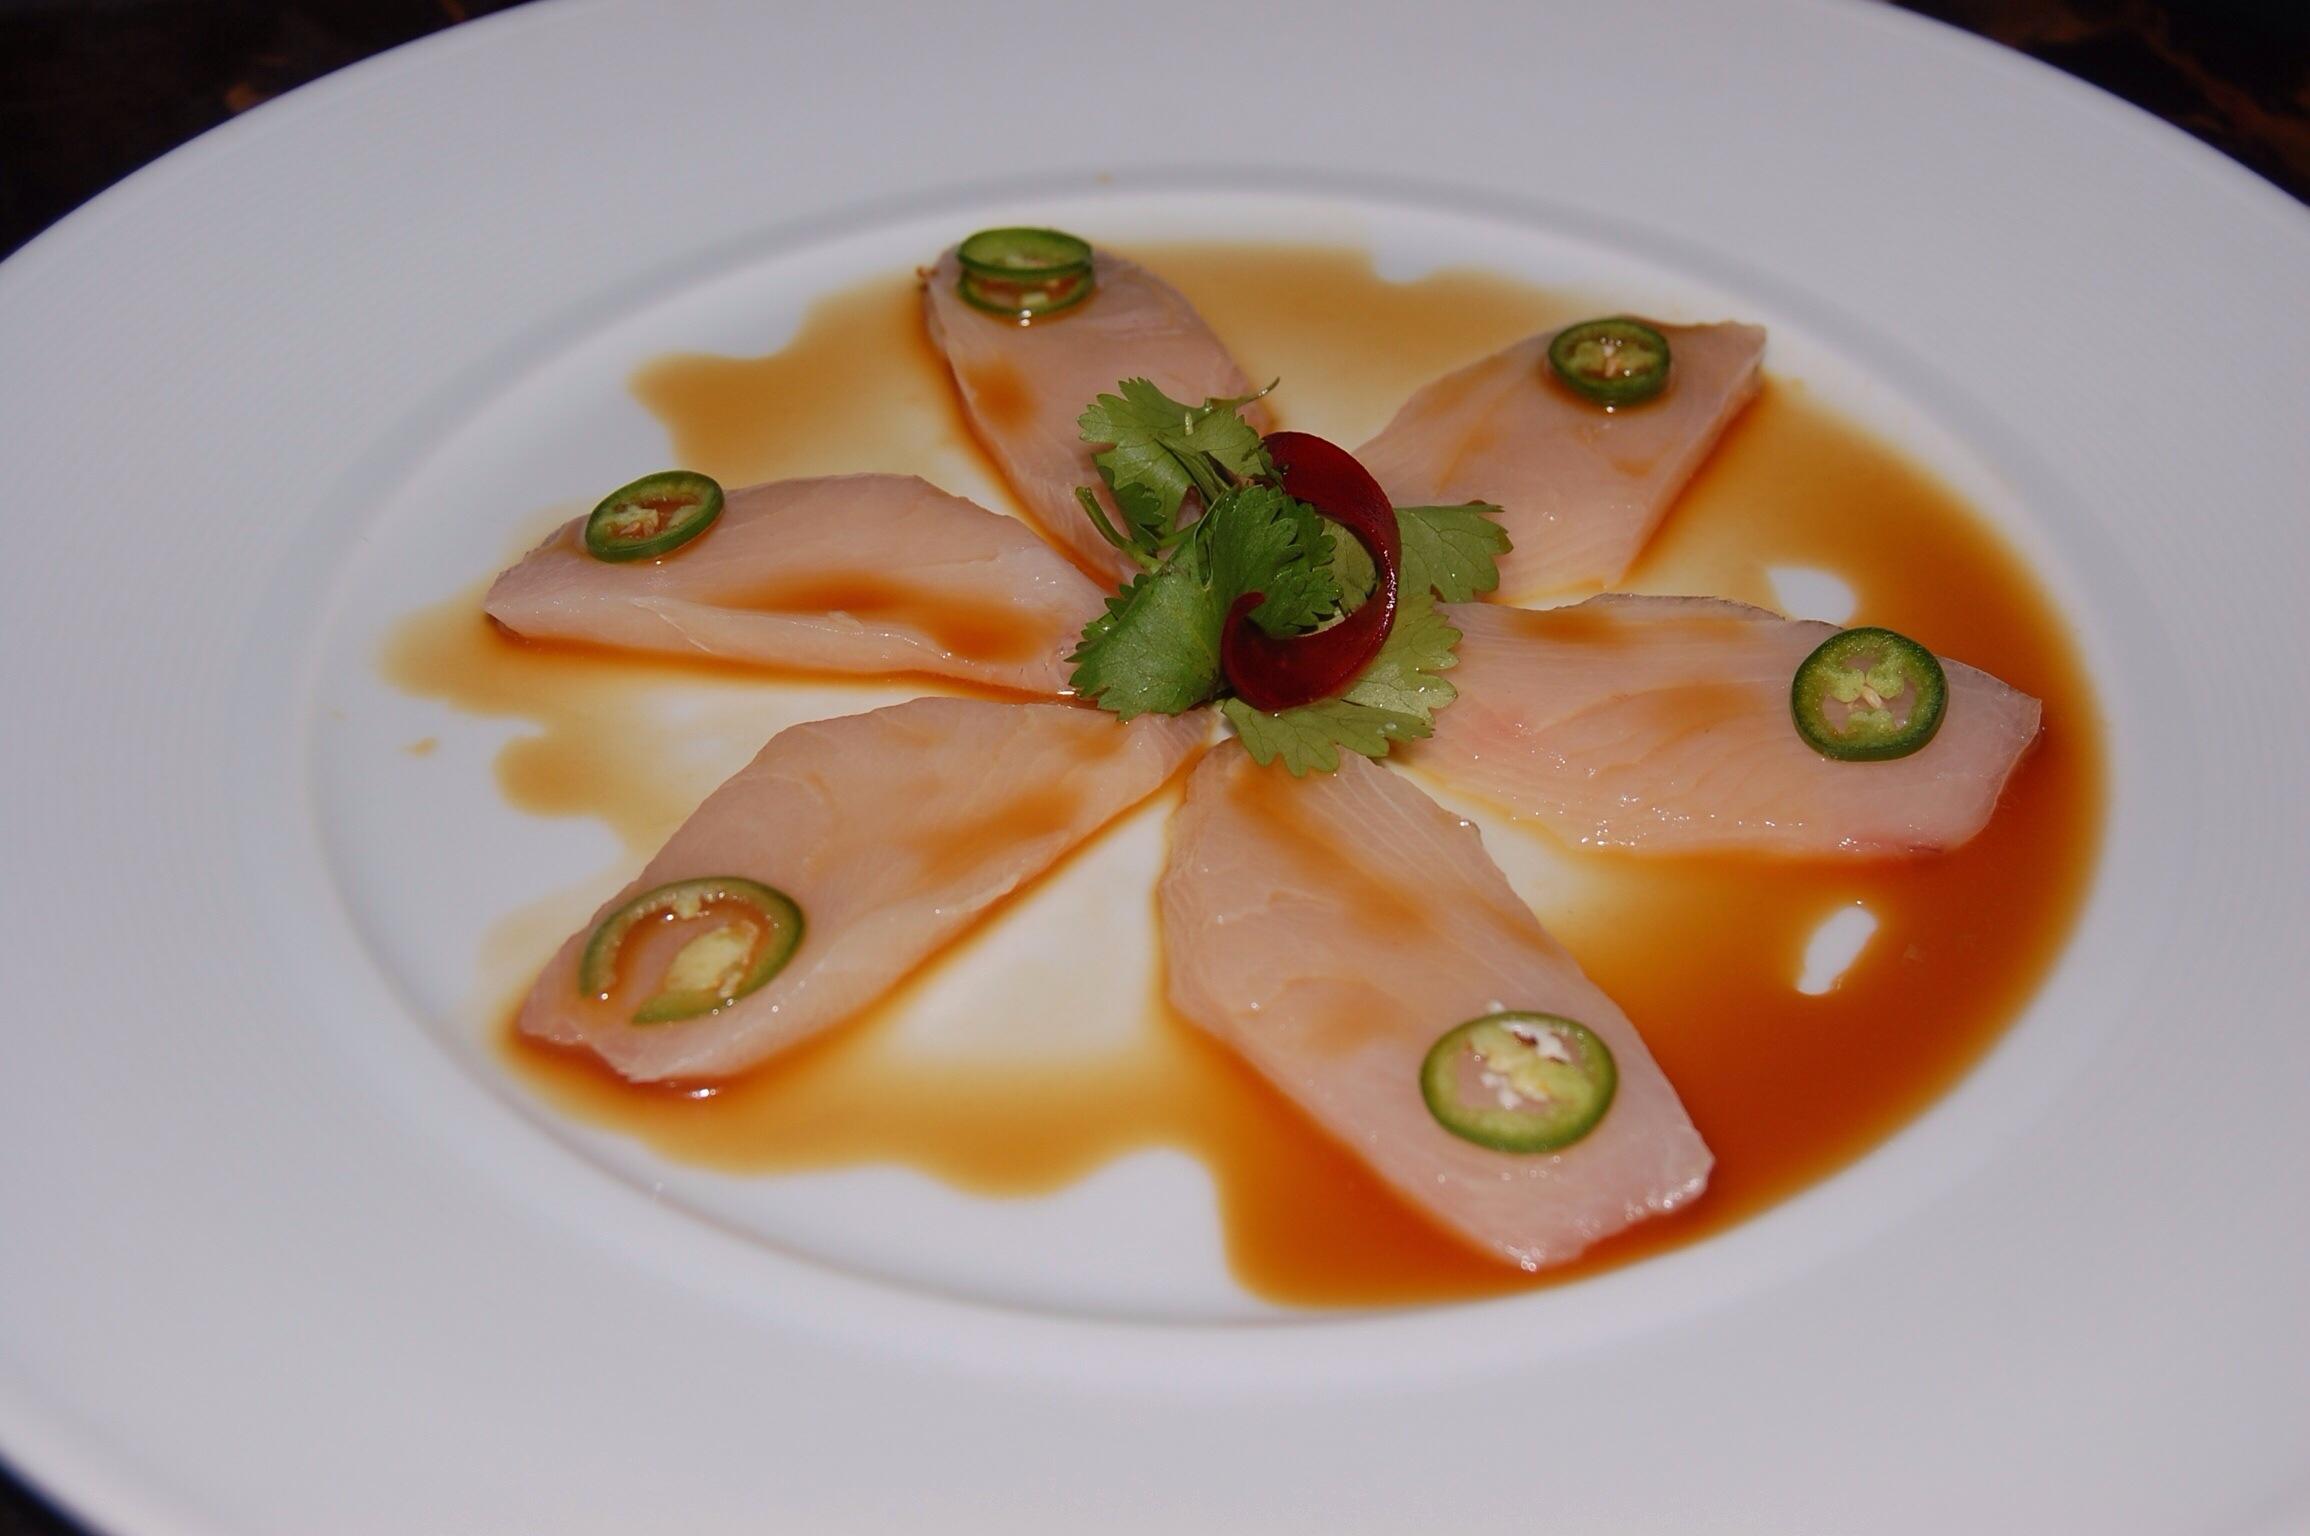 yellowtail sashimi with serrano peppers - HD2310×1536